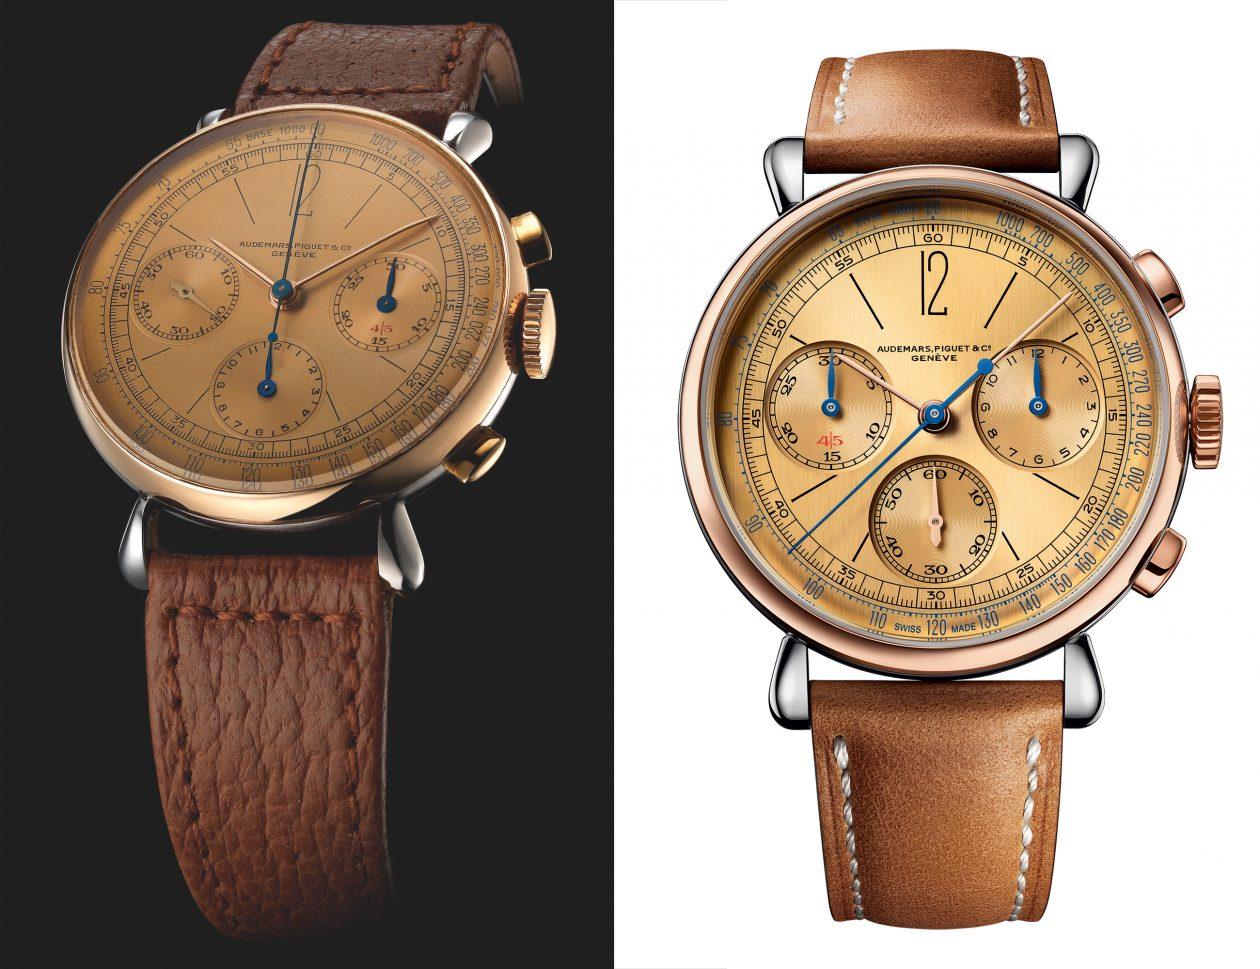 od lewej: Audemars Piguet Ref. 1533 i [Re]master01 Chronograph